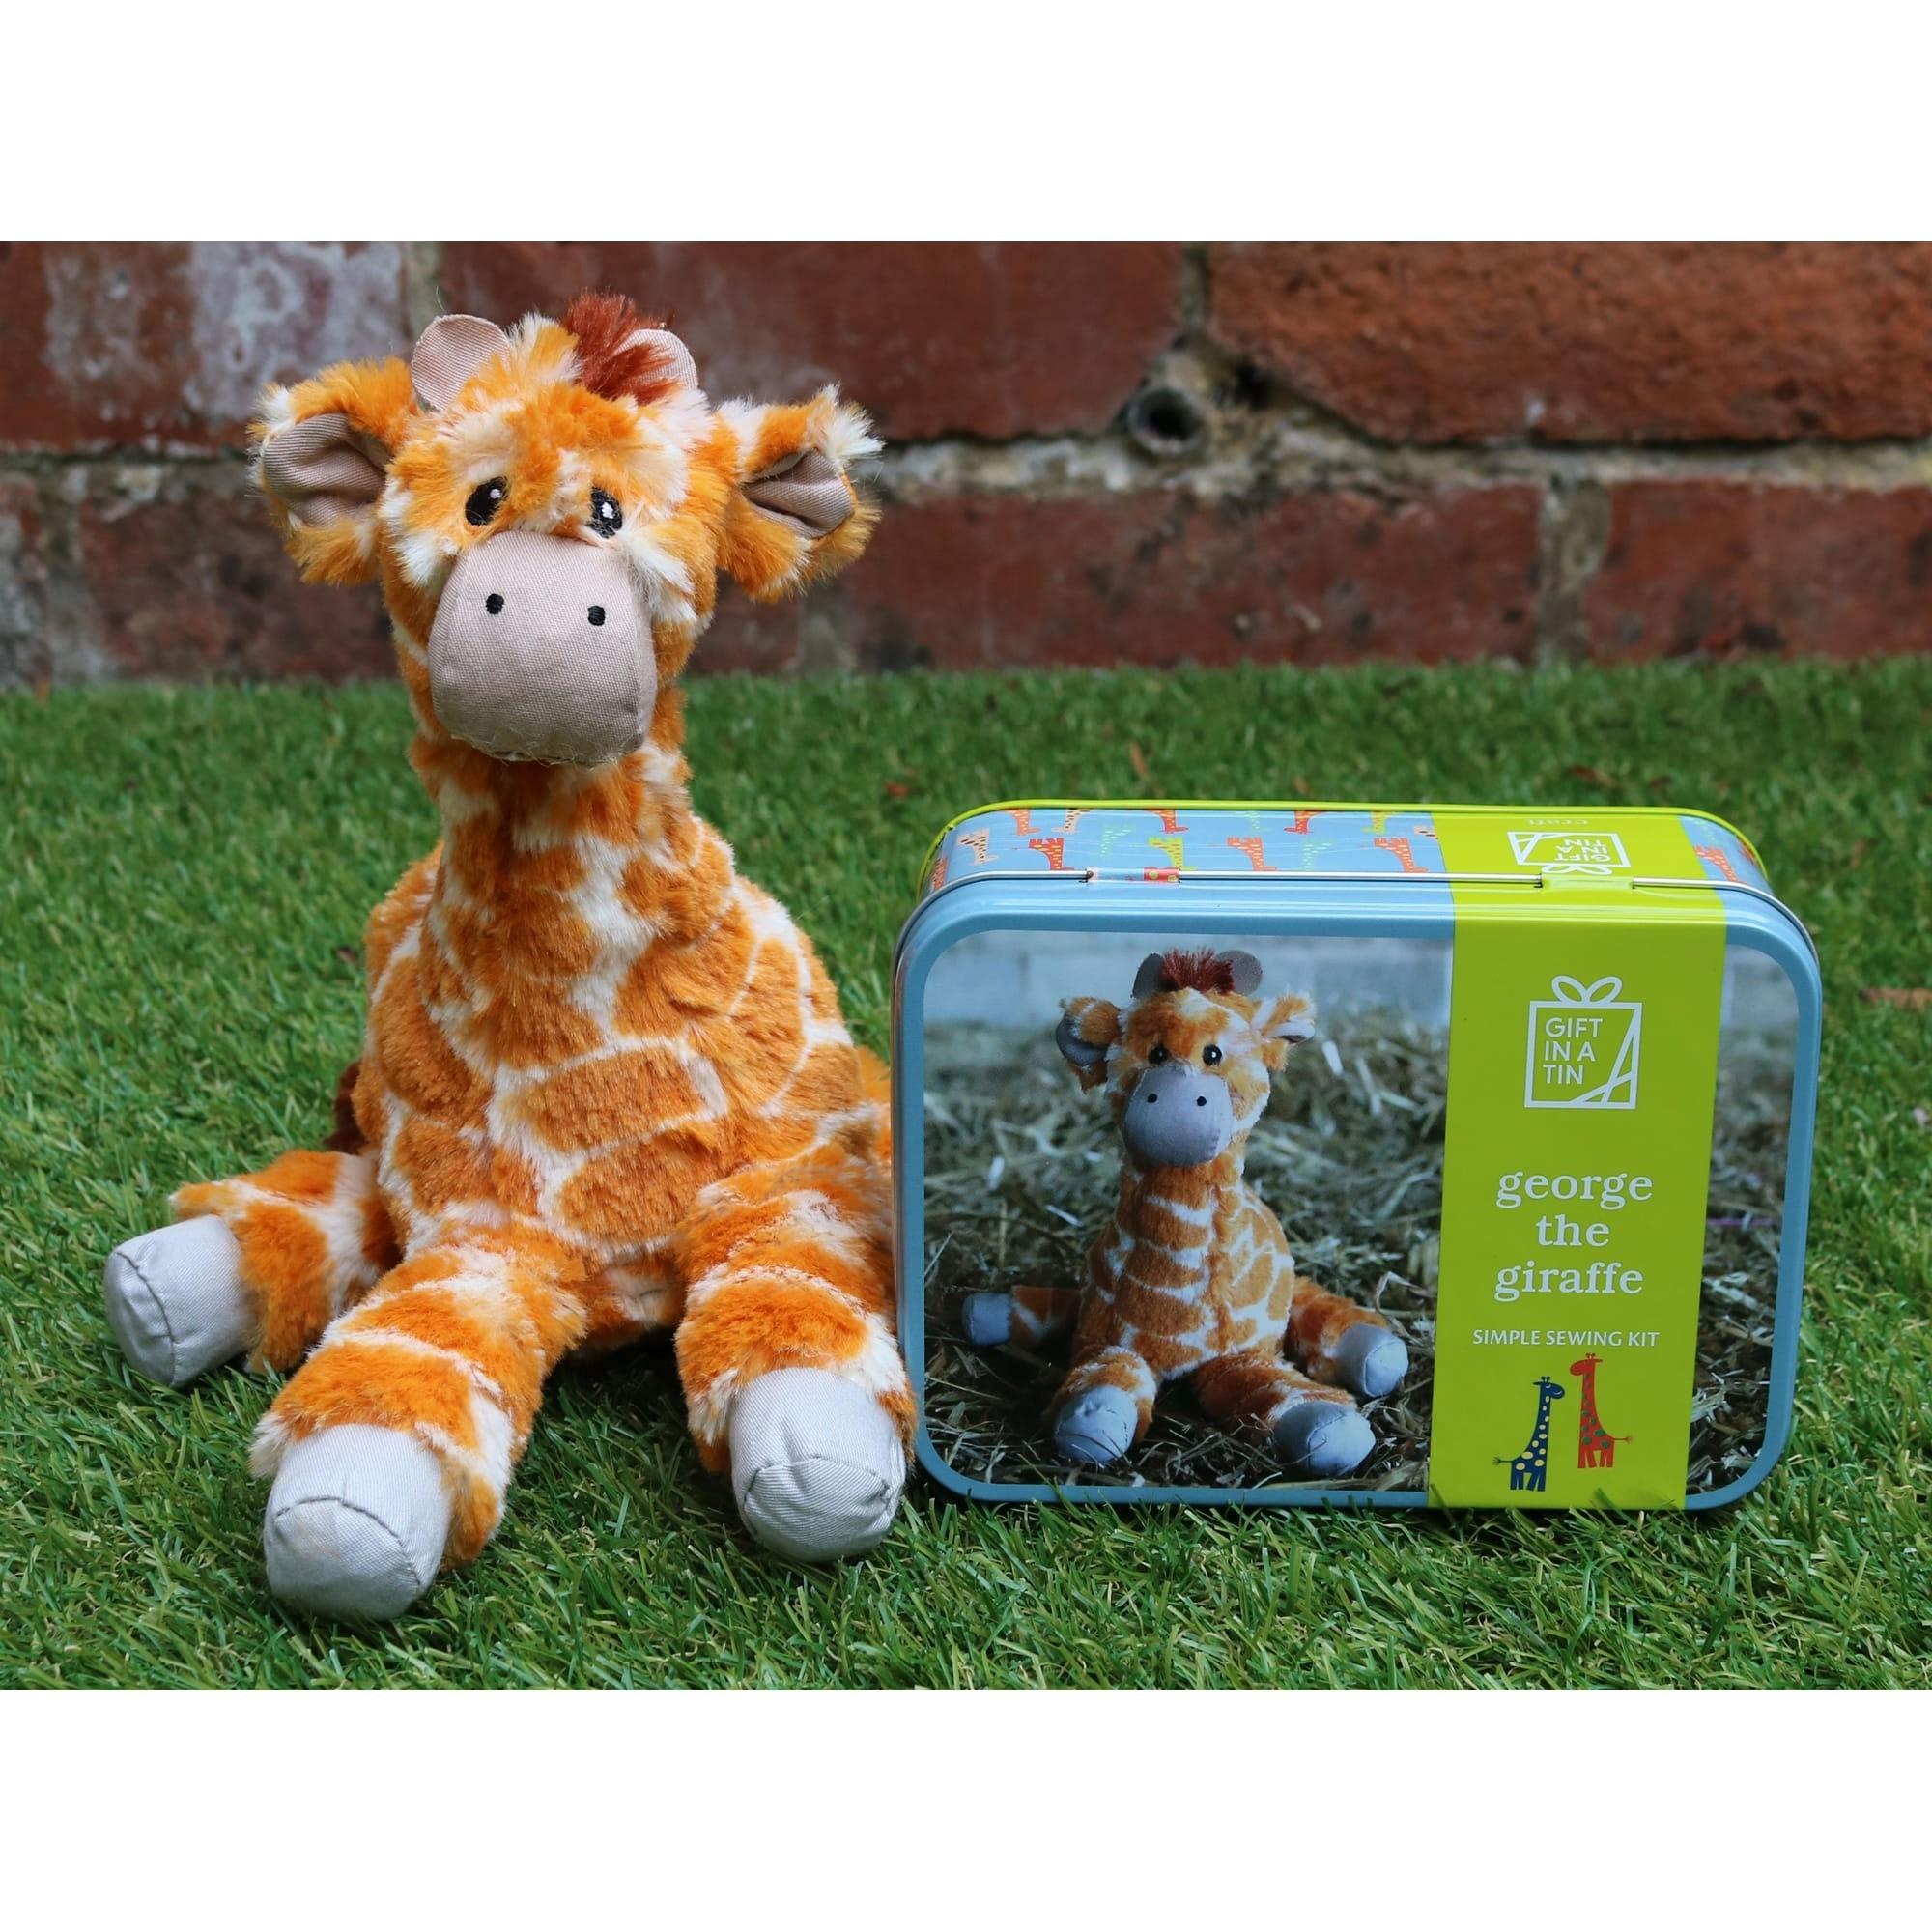 George The Giraffe